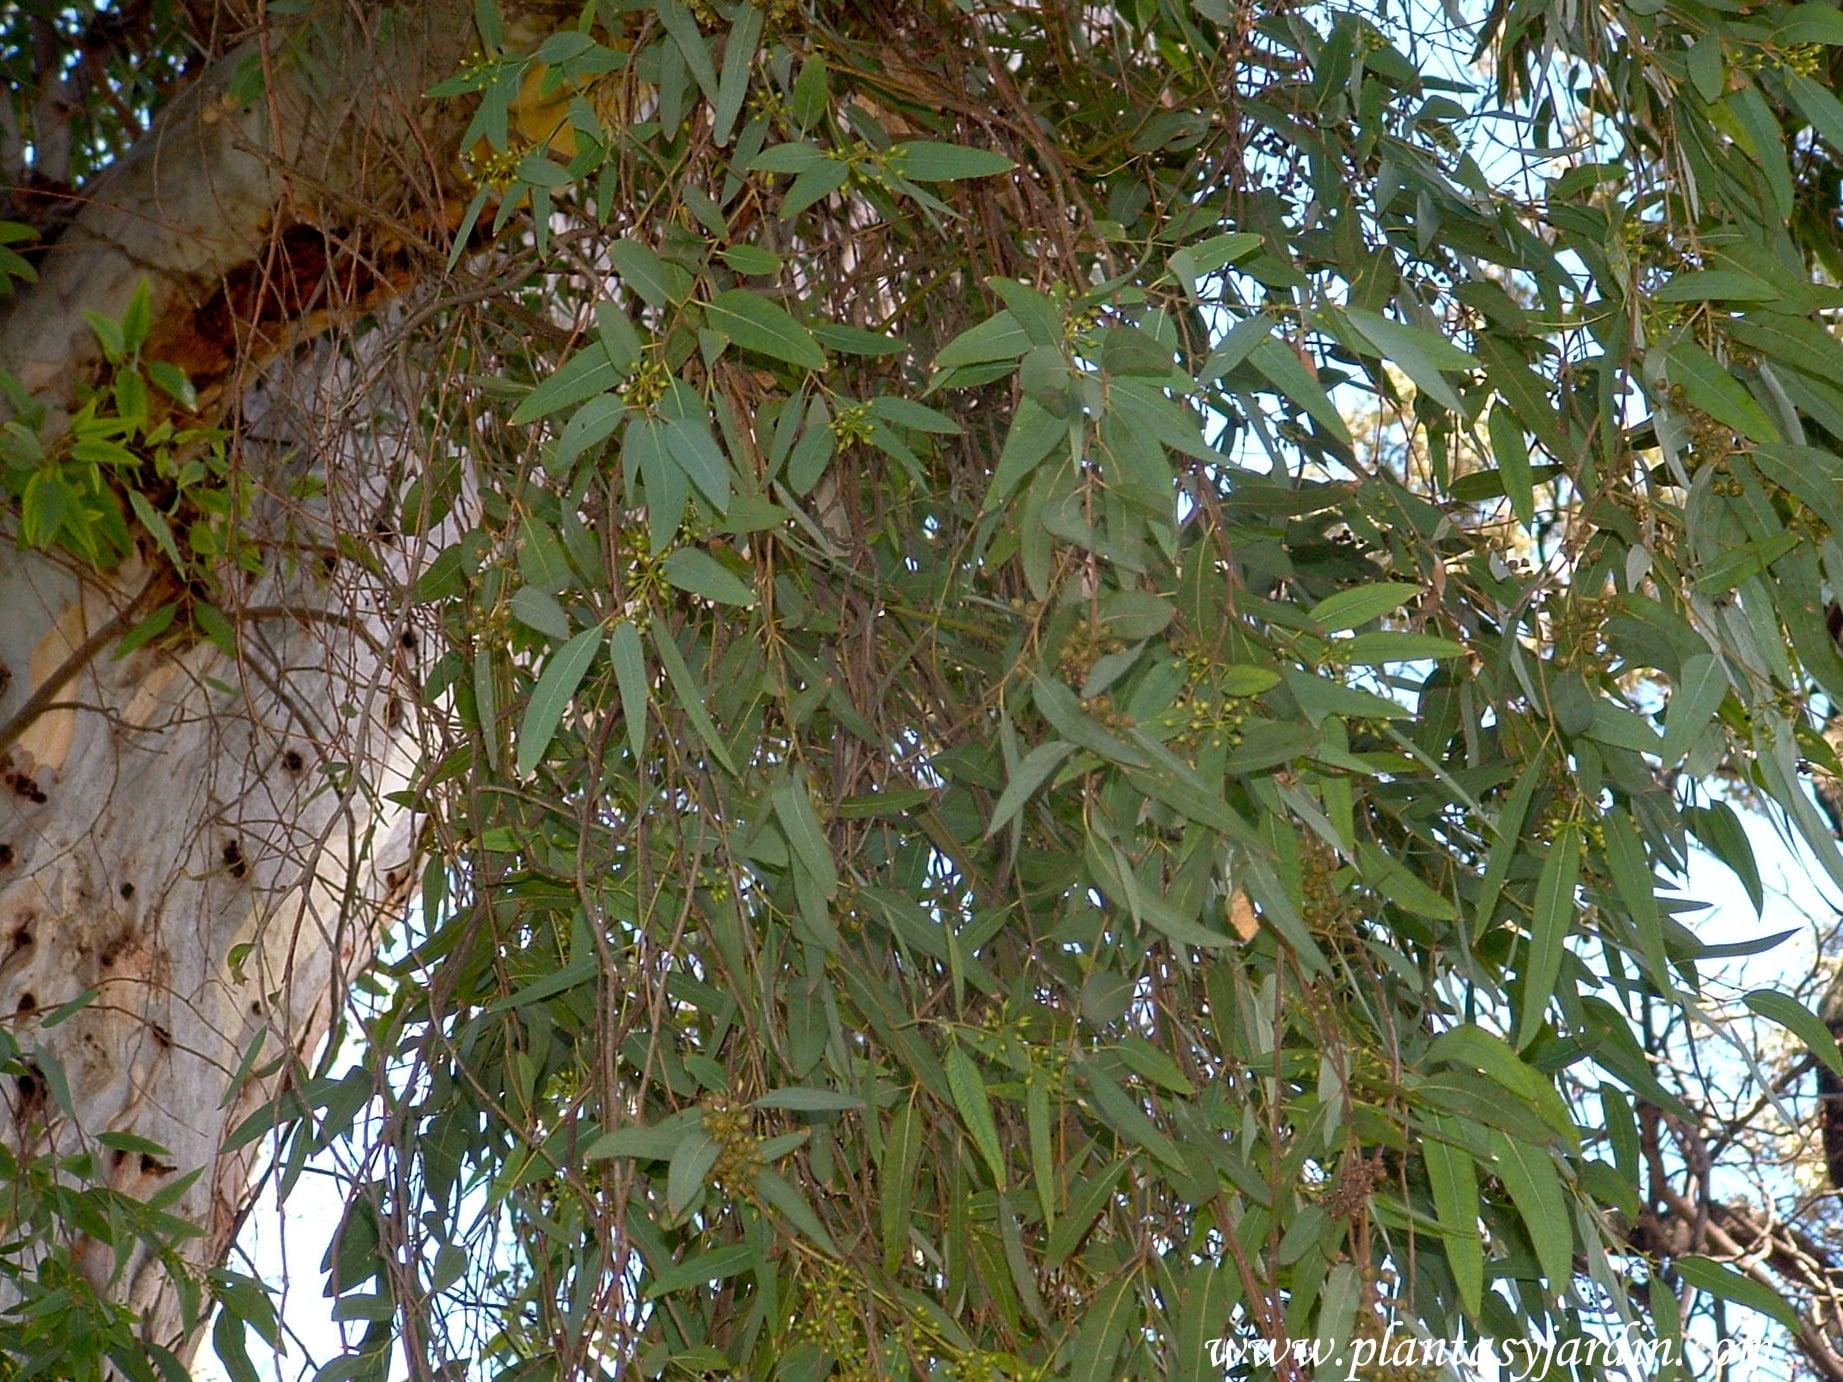 Eucalyptus camaldulensis-Eucalypto rojo, follaje.